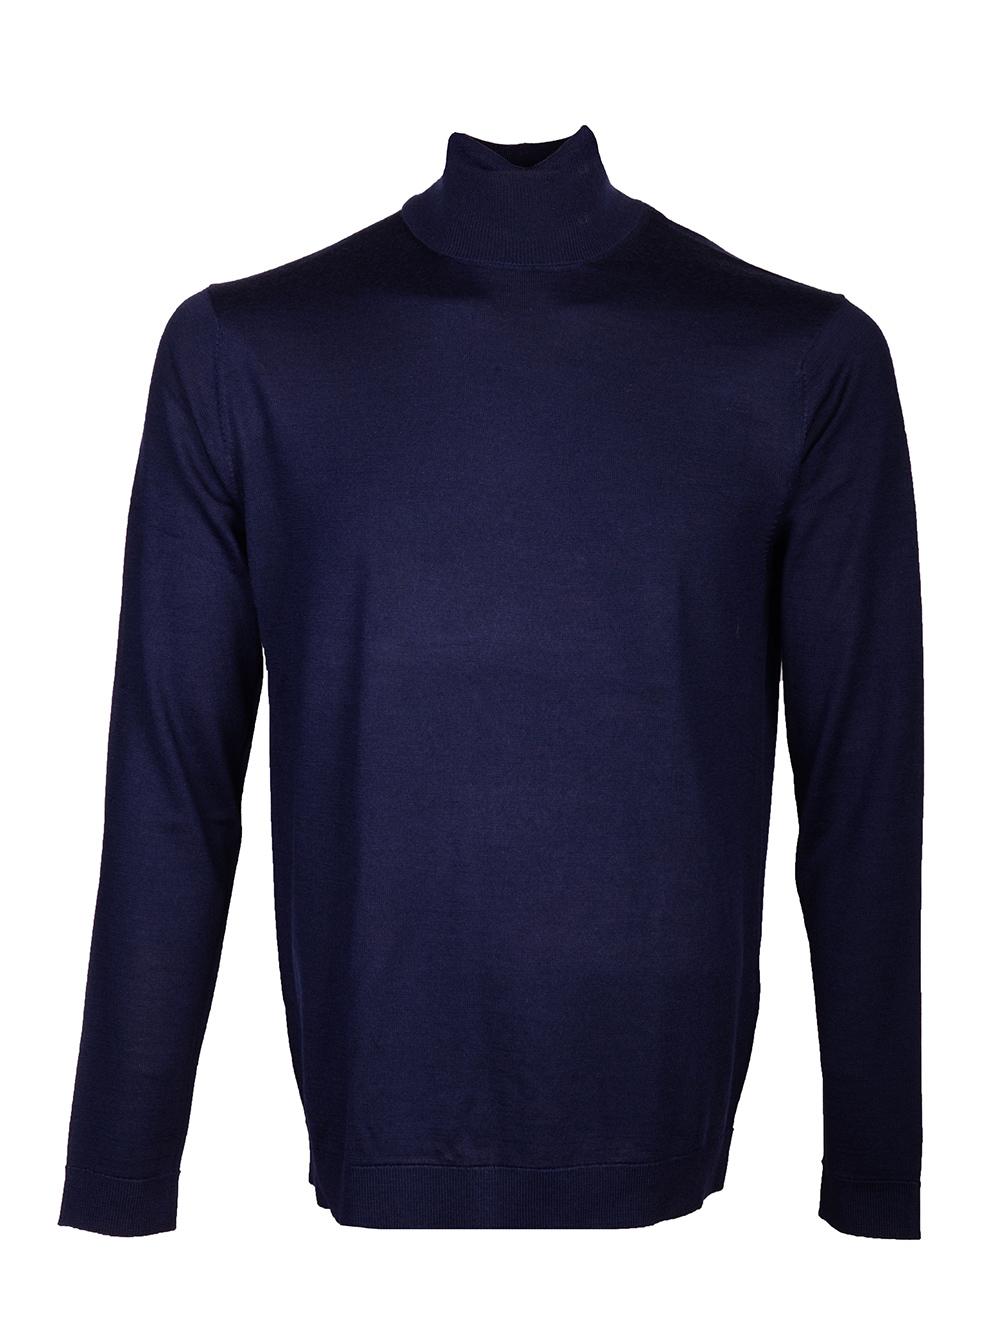 SELECTED Μπλούζα πουλόβερ 160068504 ΜΠΛΕ